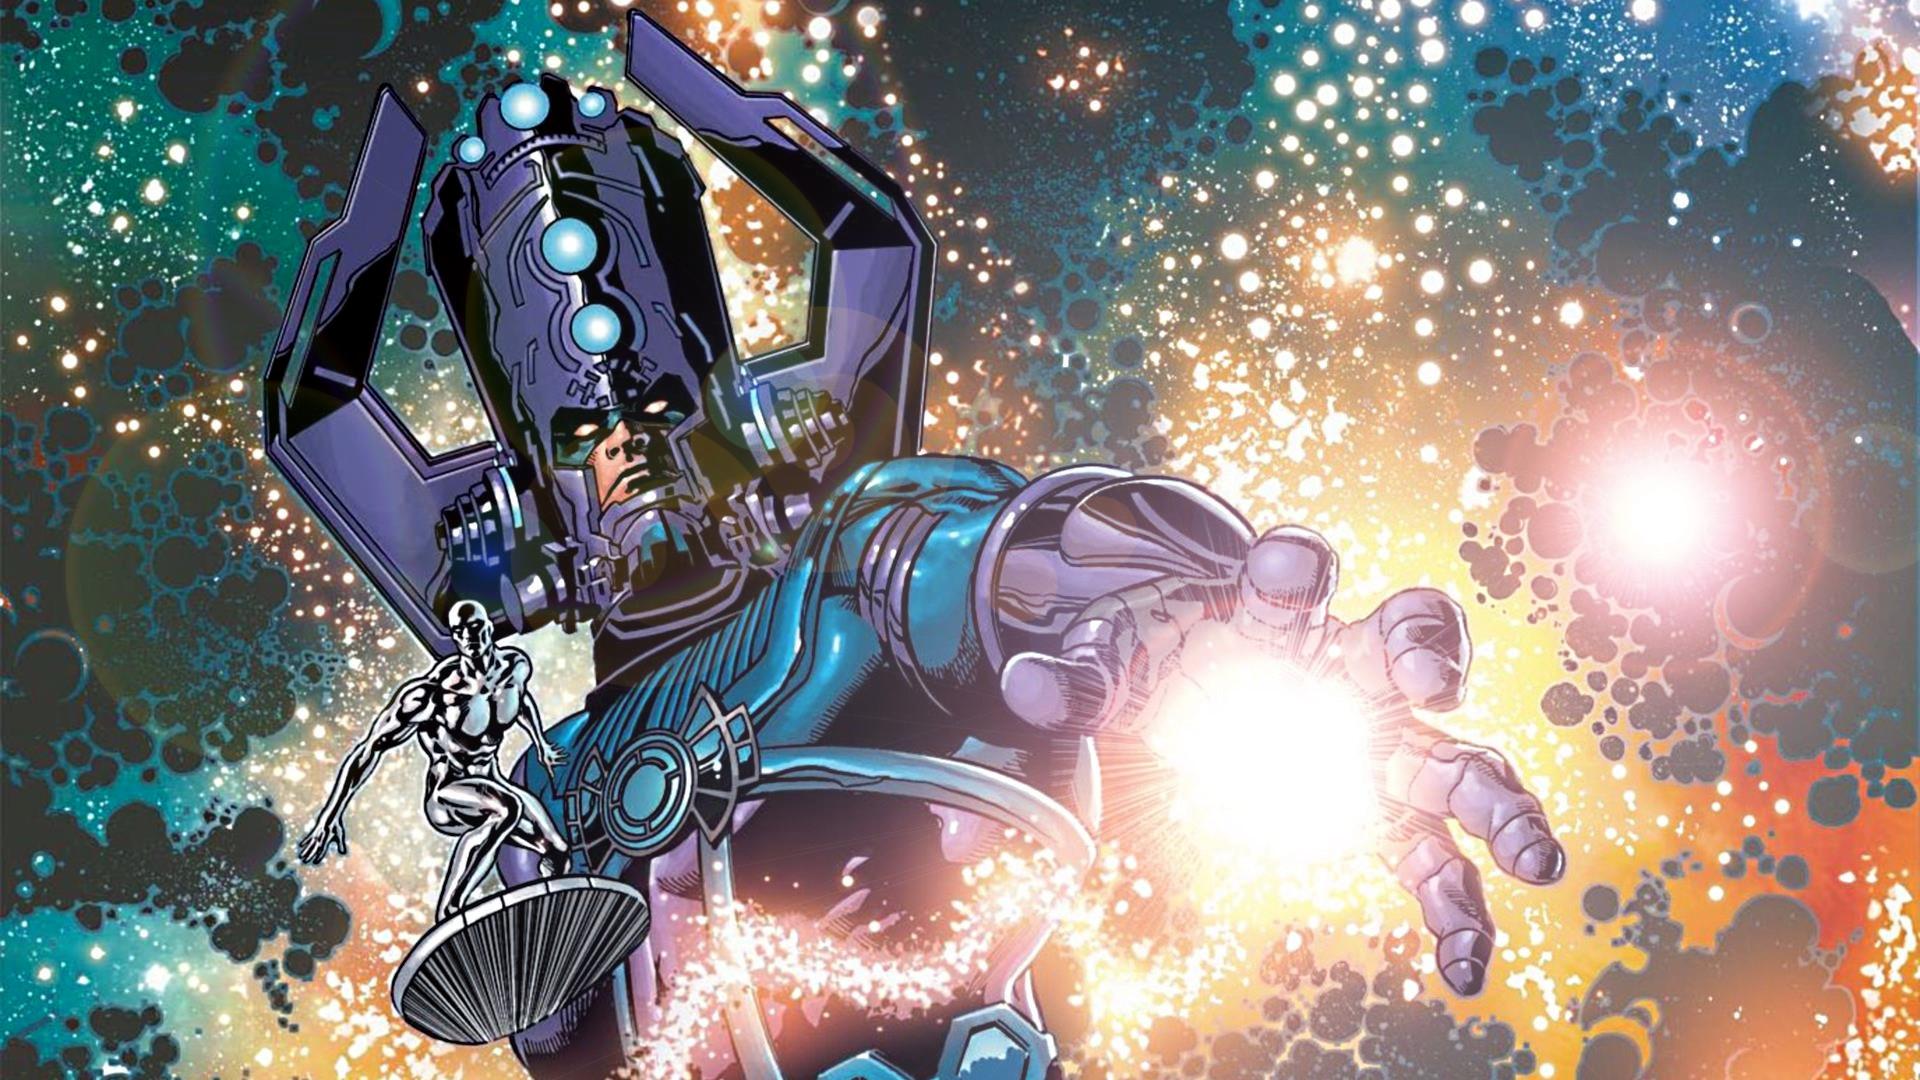 … Galactus and The Silver Surfer by ProfessorAdagio